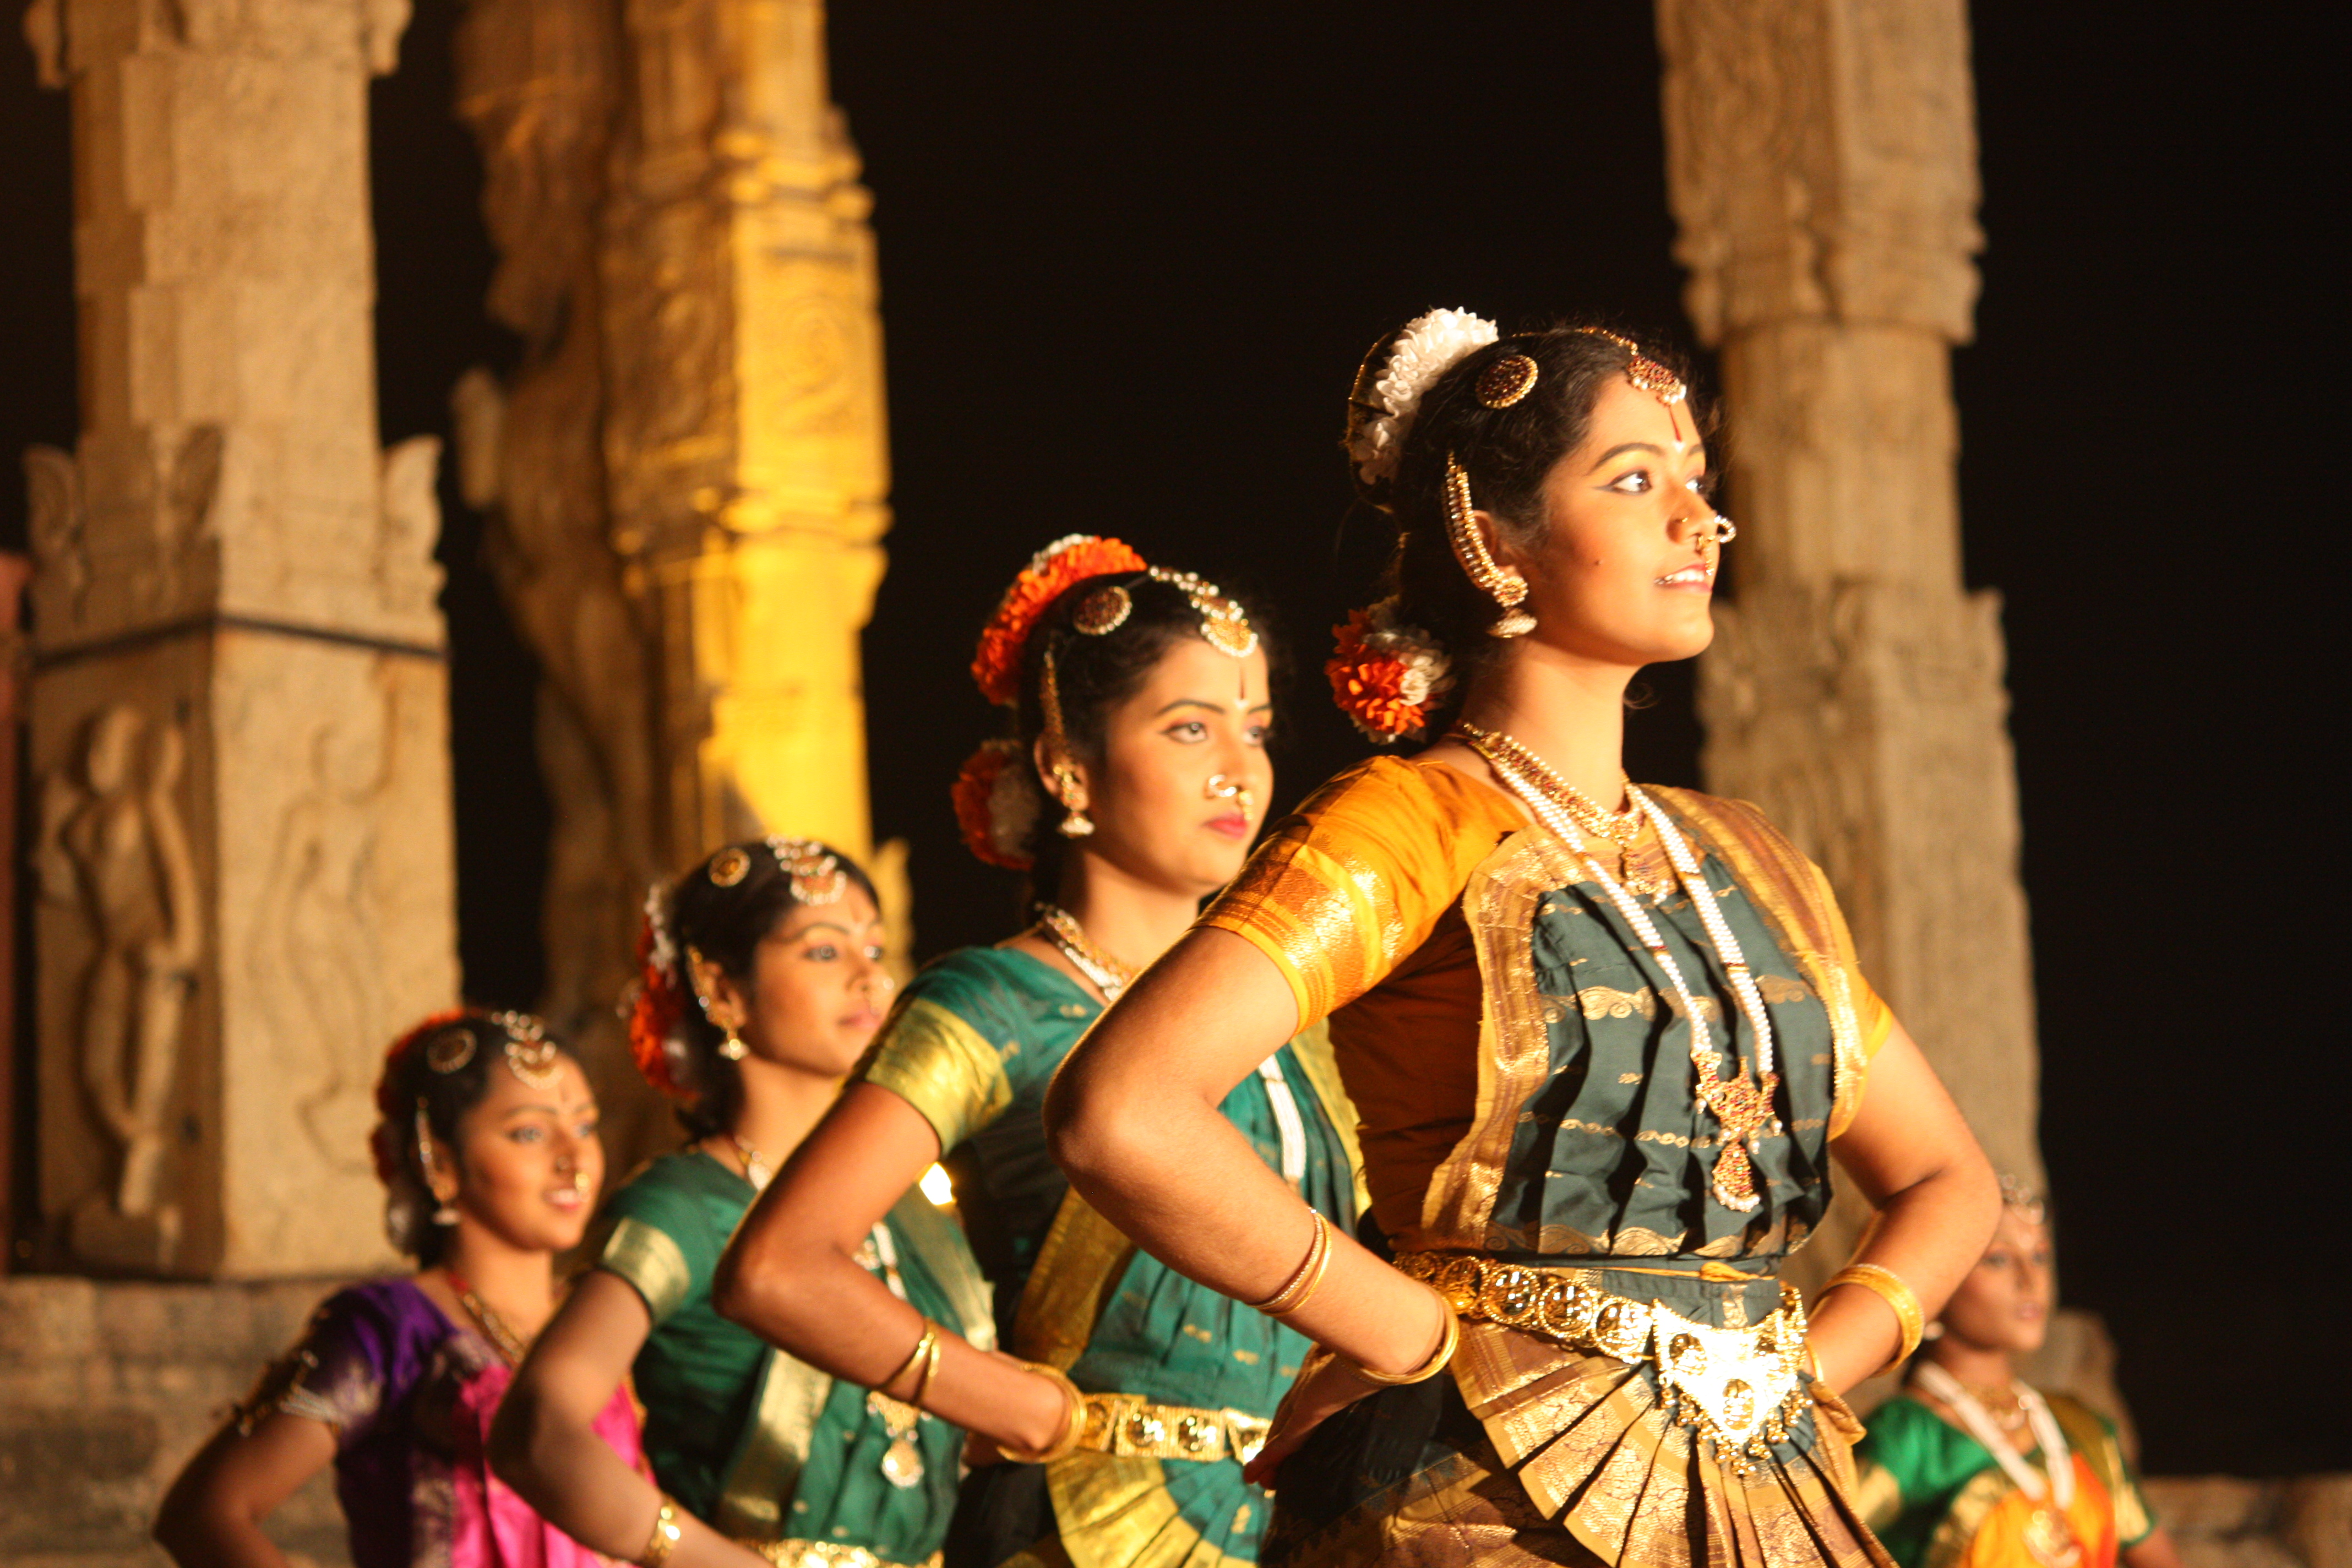 essay on n cultural heritage 91 121 113 106 essay on n cultural heritage